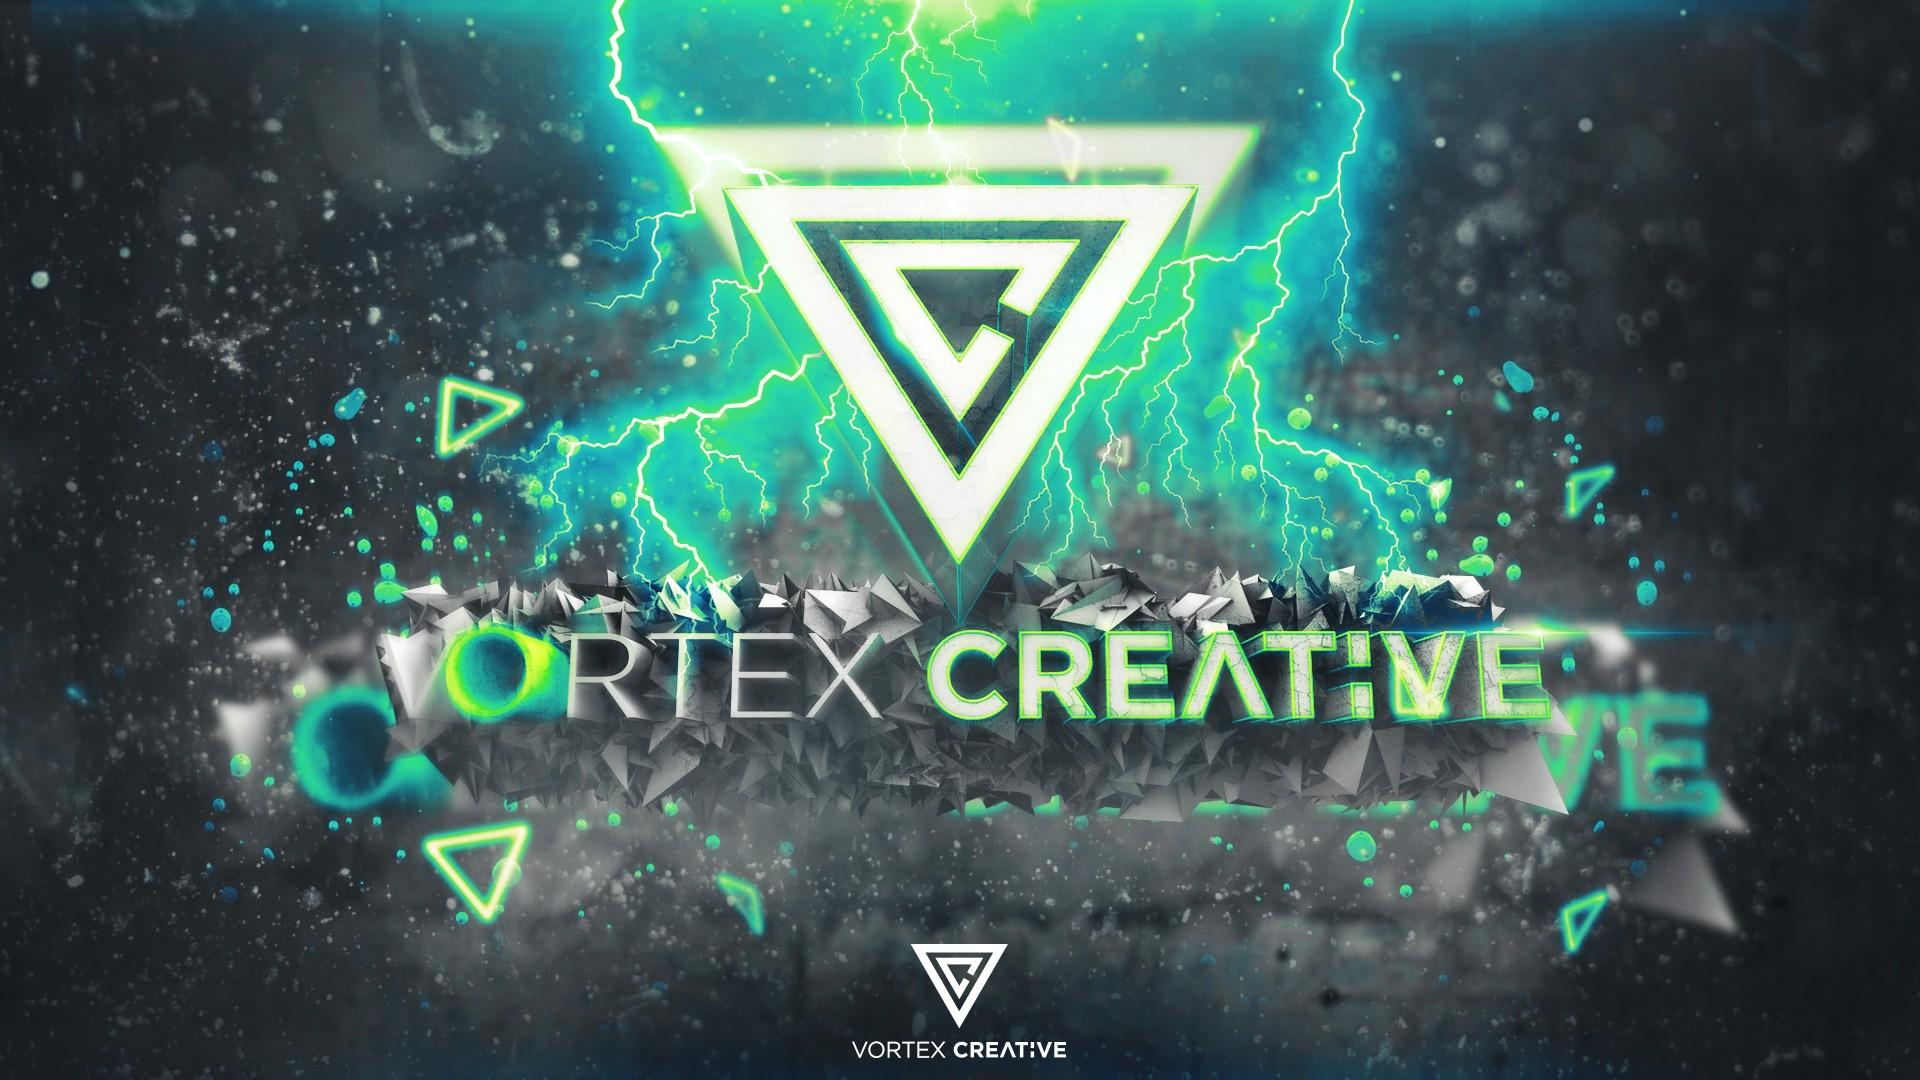 Digital Art Video Games Abstract Space Artwork Text Logo Graphic Design Atmosphere Vortex Midnight Screenshot Graphics